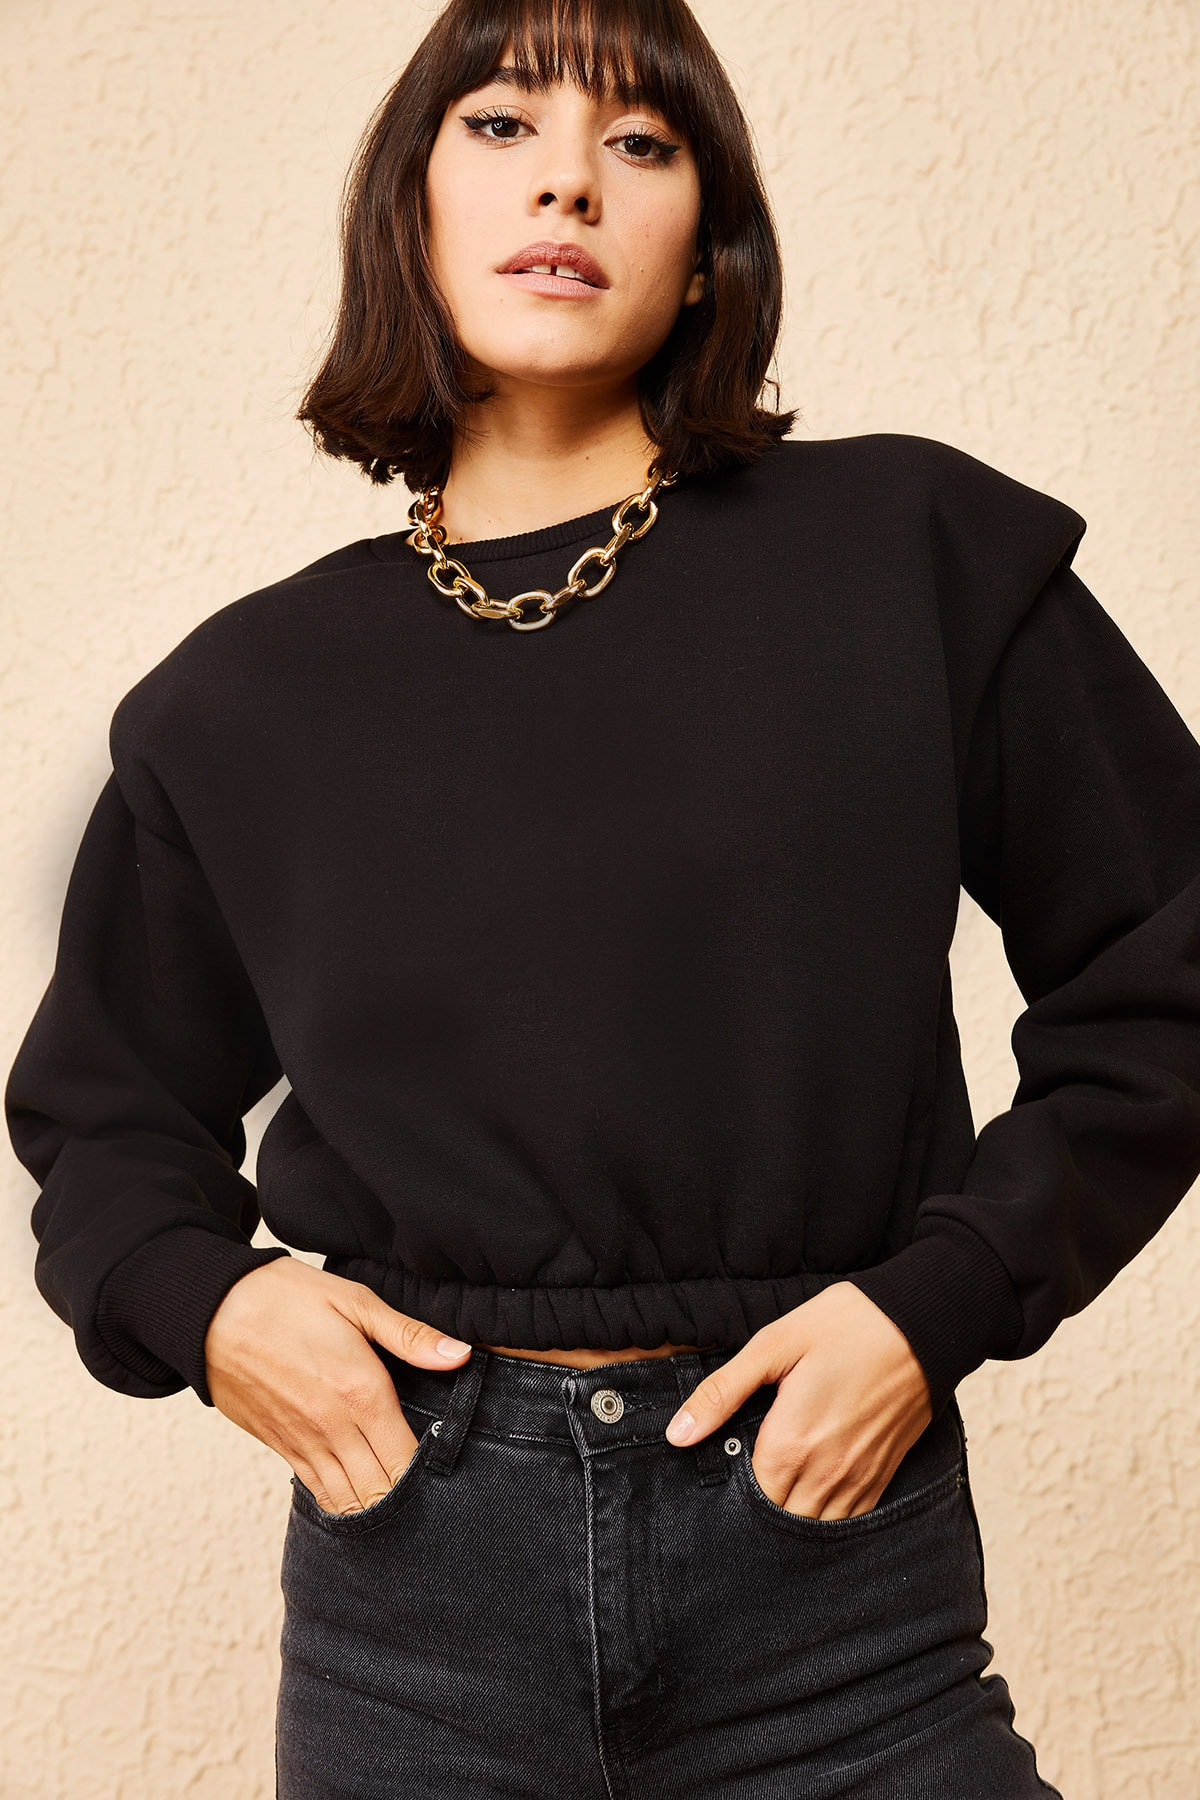 Bianco Lucci Kadın Siyah Üç İplik Şardonlu Omuzu Vatkalı Crop Sweatshirt 10161041